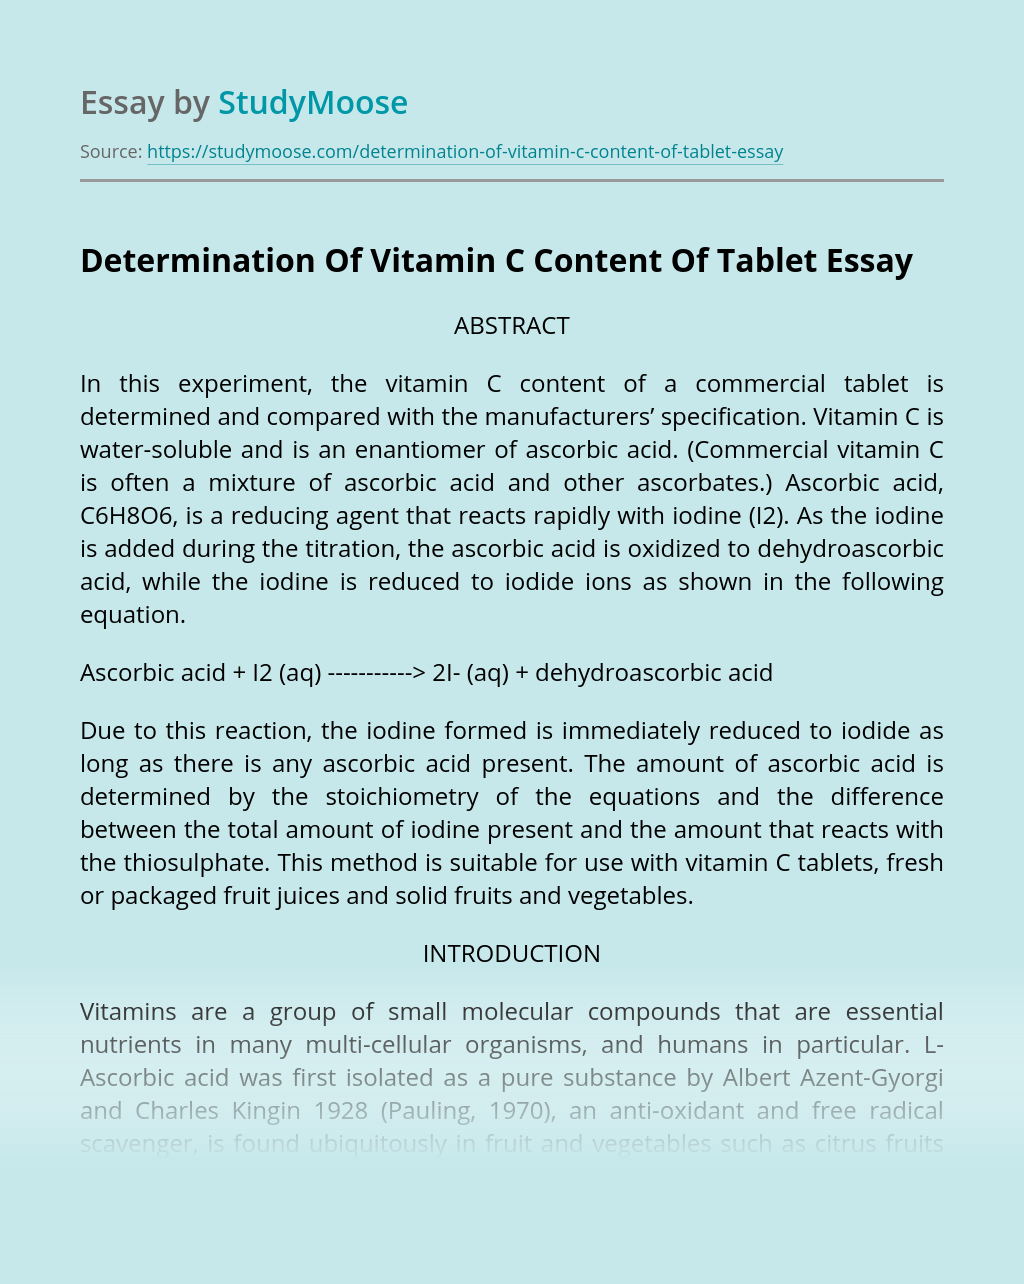 Determination Of Vitamin C Content Of Tablet